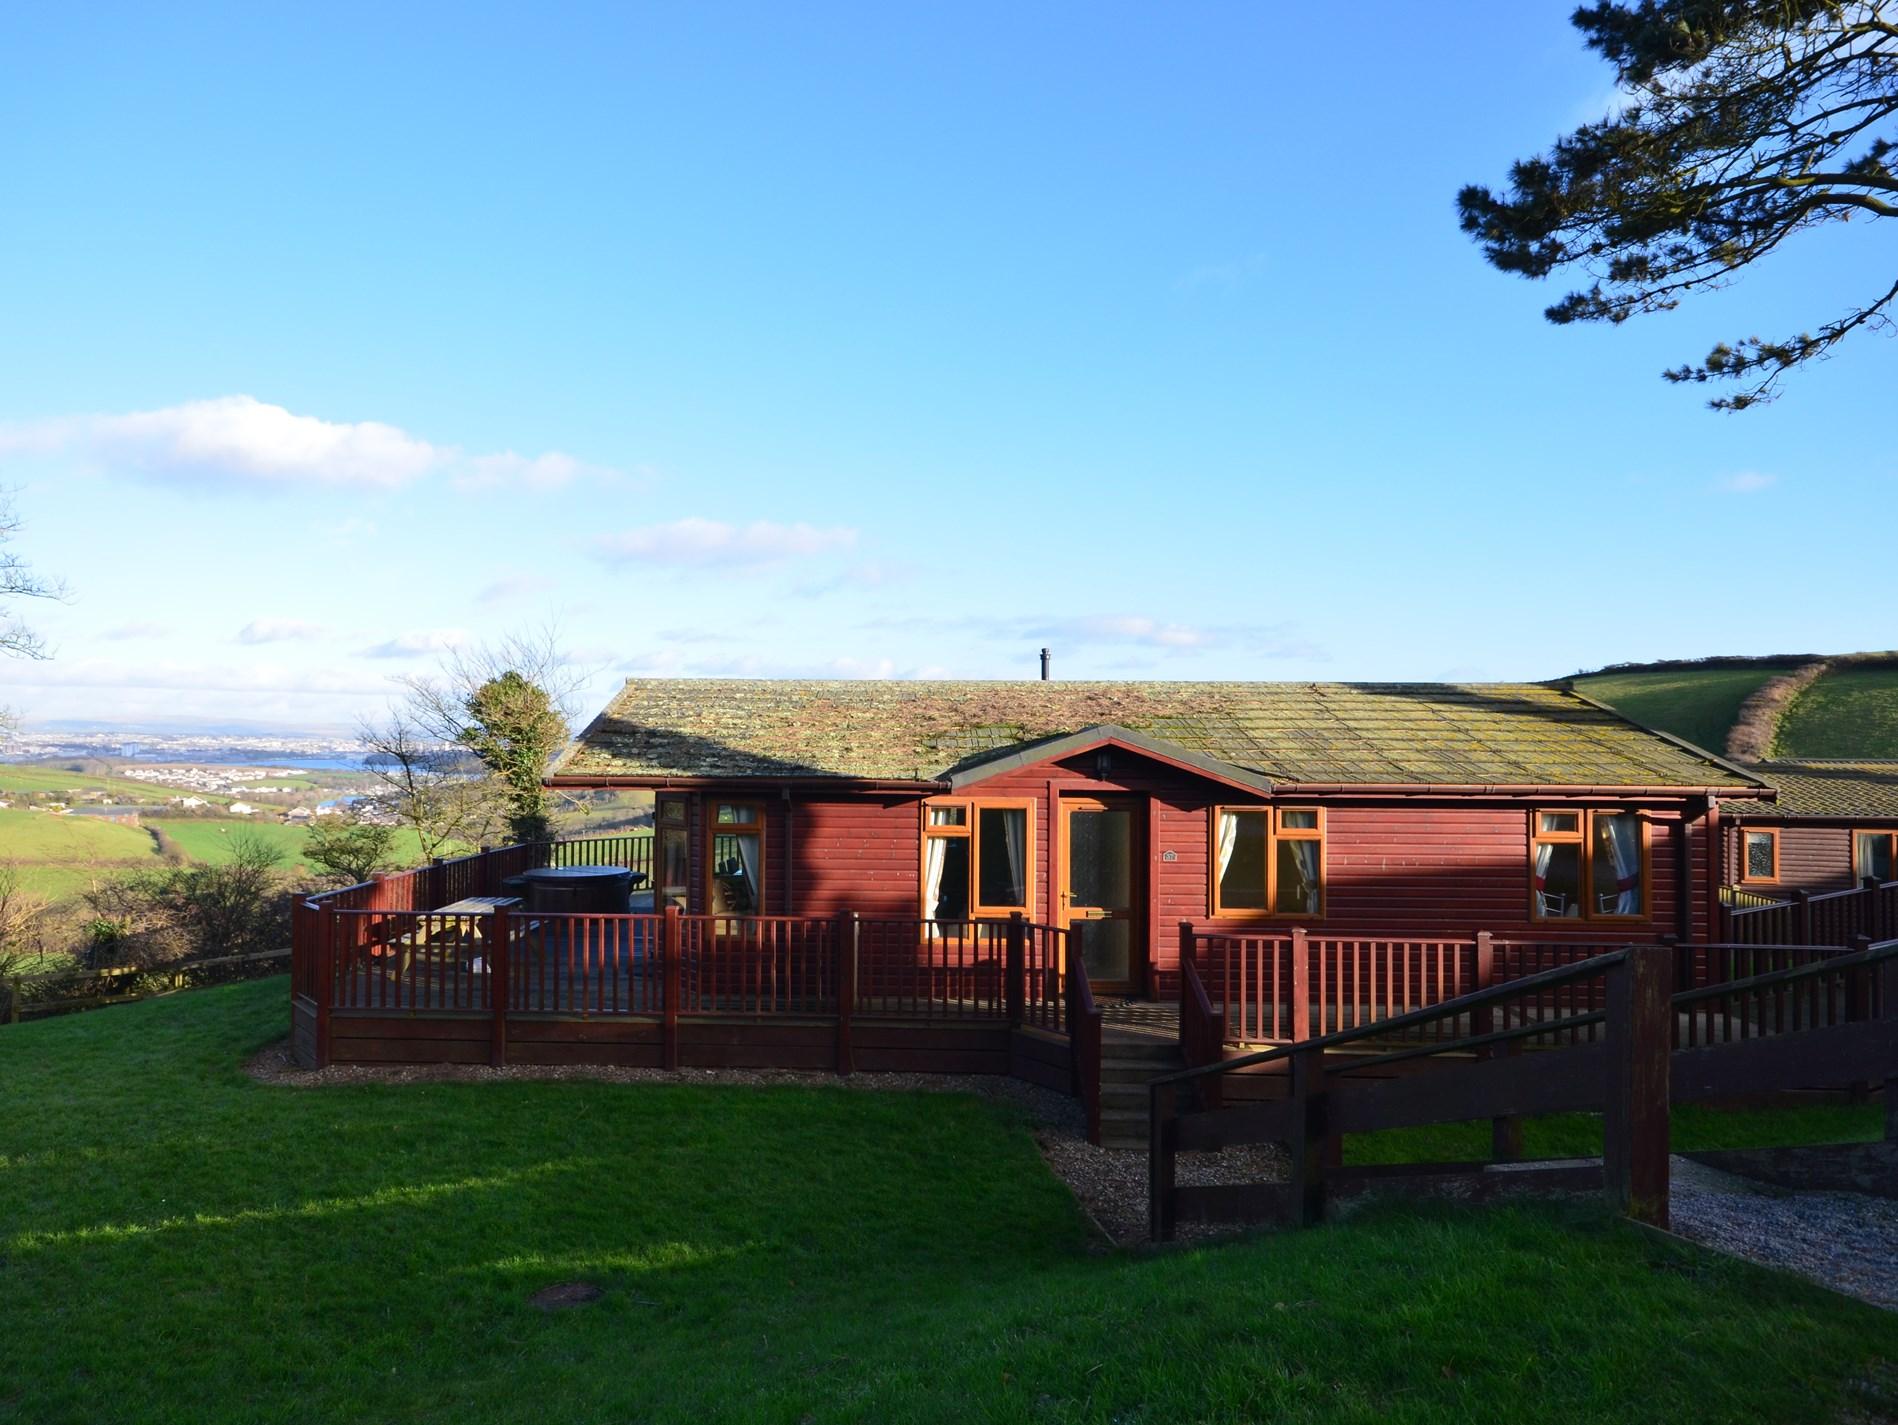 3 Bedroom Log Cabin in South Cornwall, Cornwall